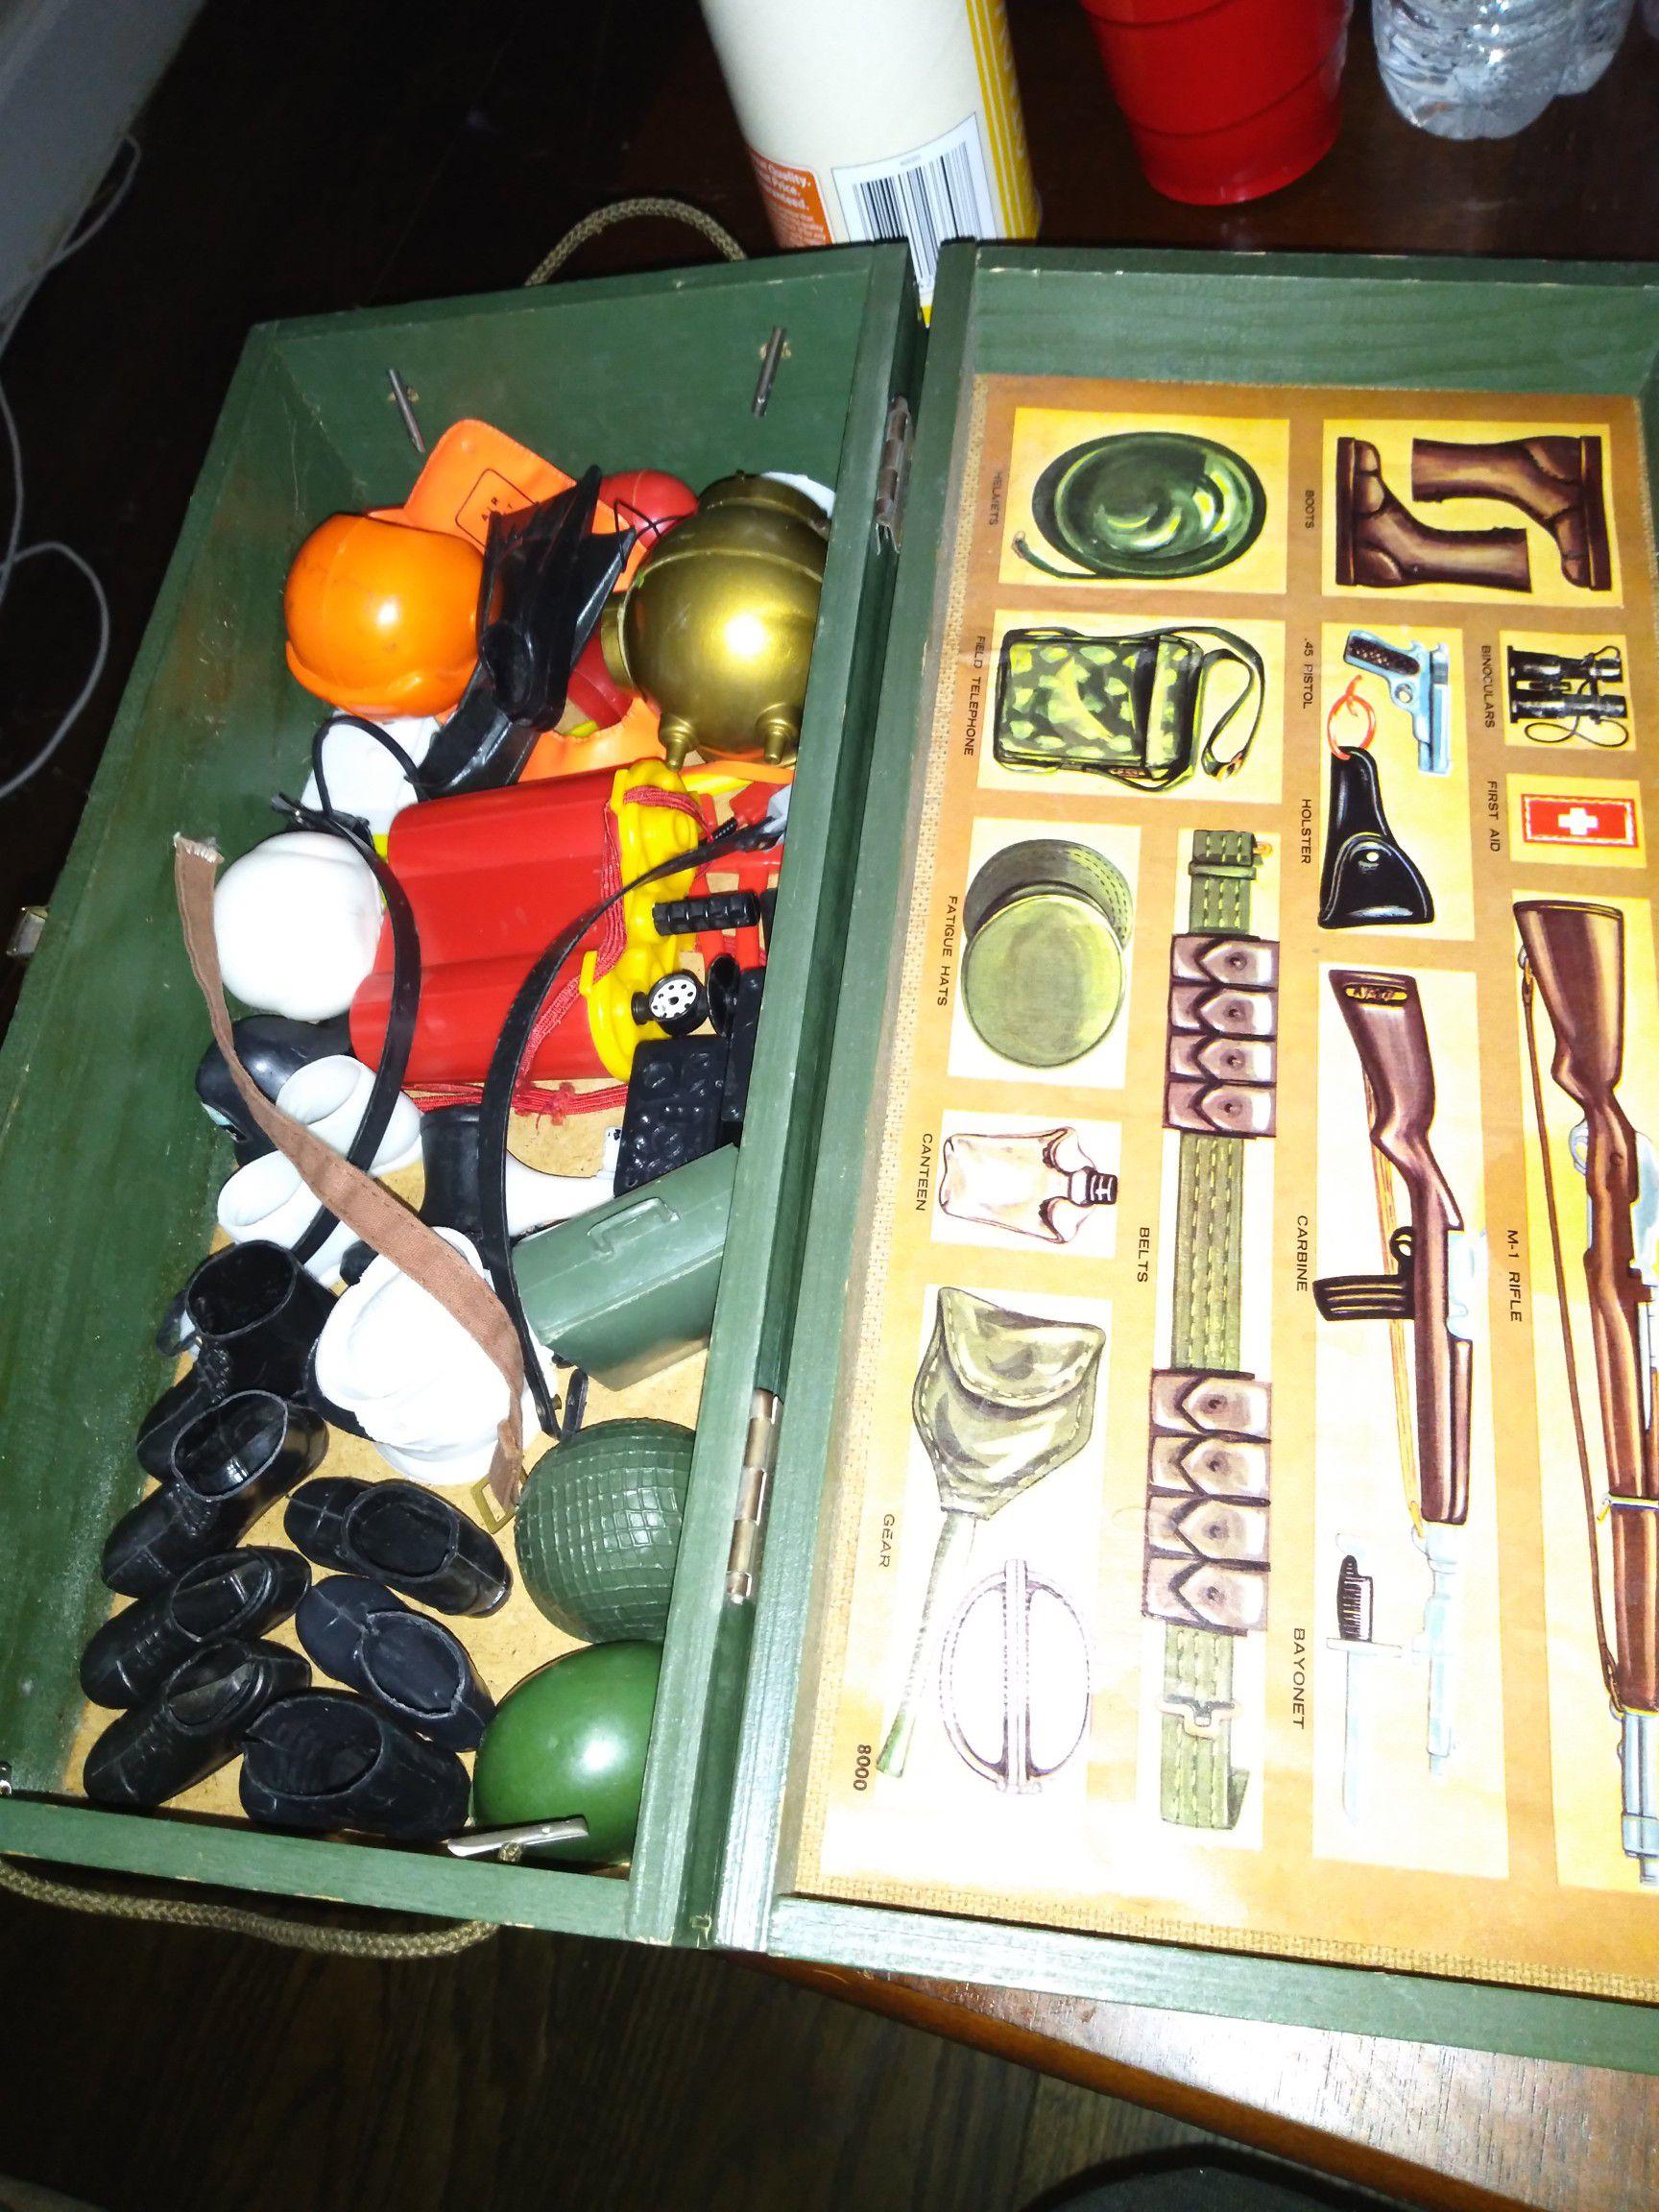 GI Joe along with accessories I'm building hub